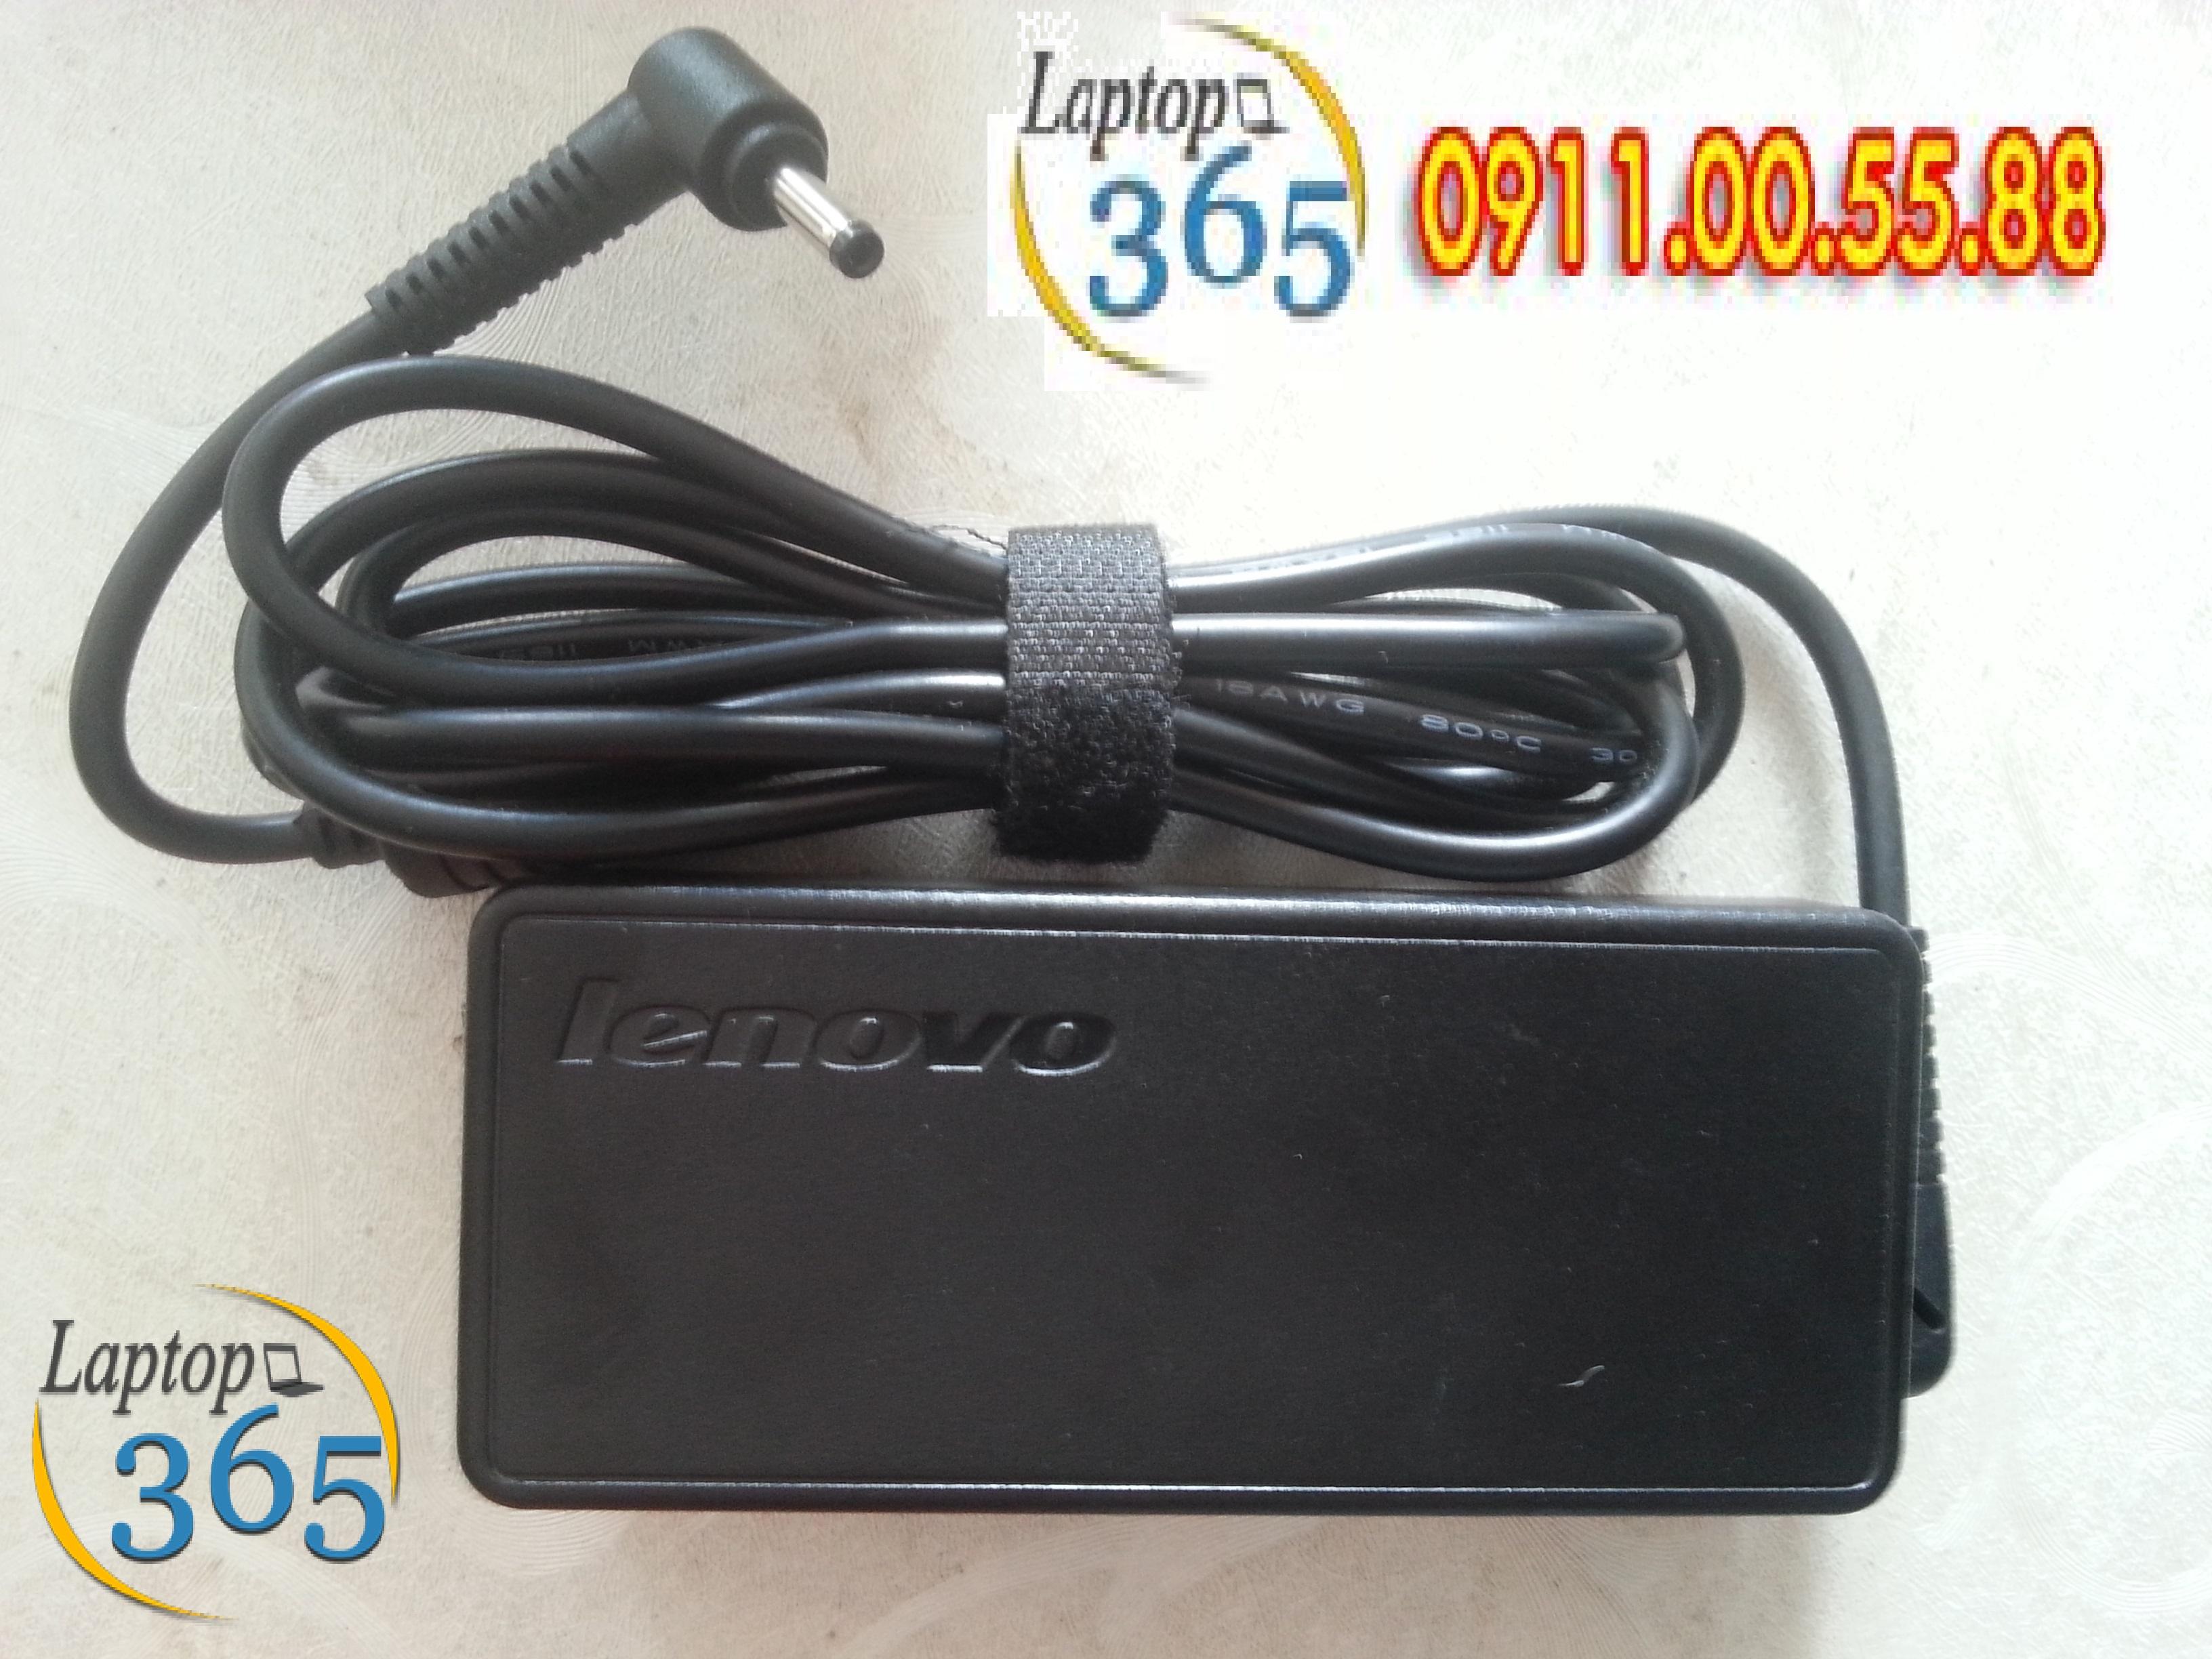 Sạc laptop Lenovo IDEAPAD 110